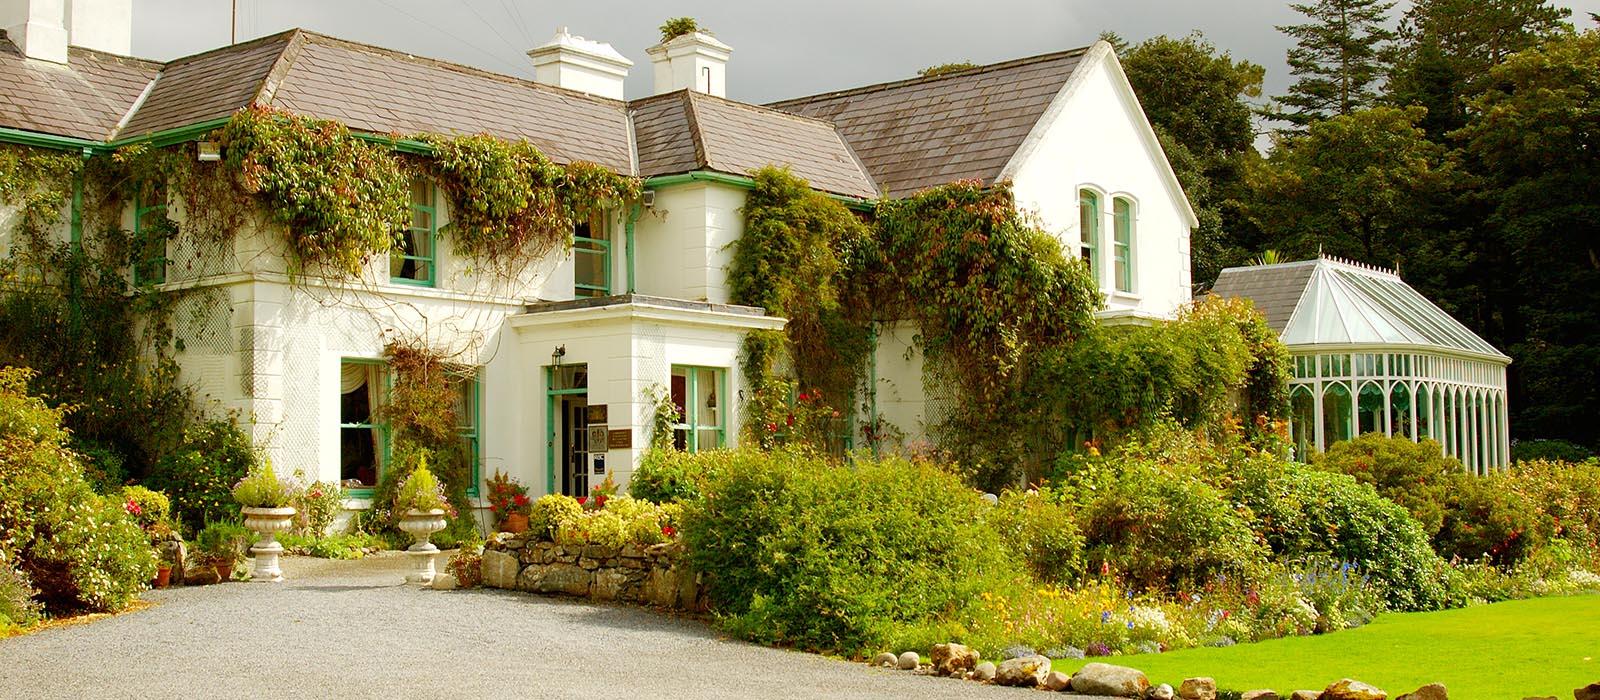 Book Of House Plans Ireland on ireland house drawings, ireland cottage floor plans, ireland lifestyle,